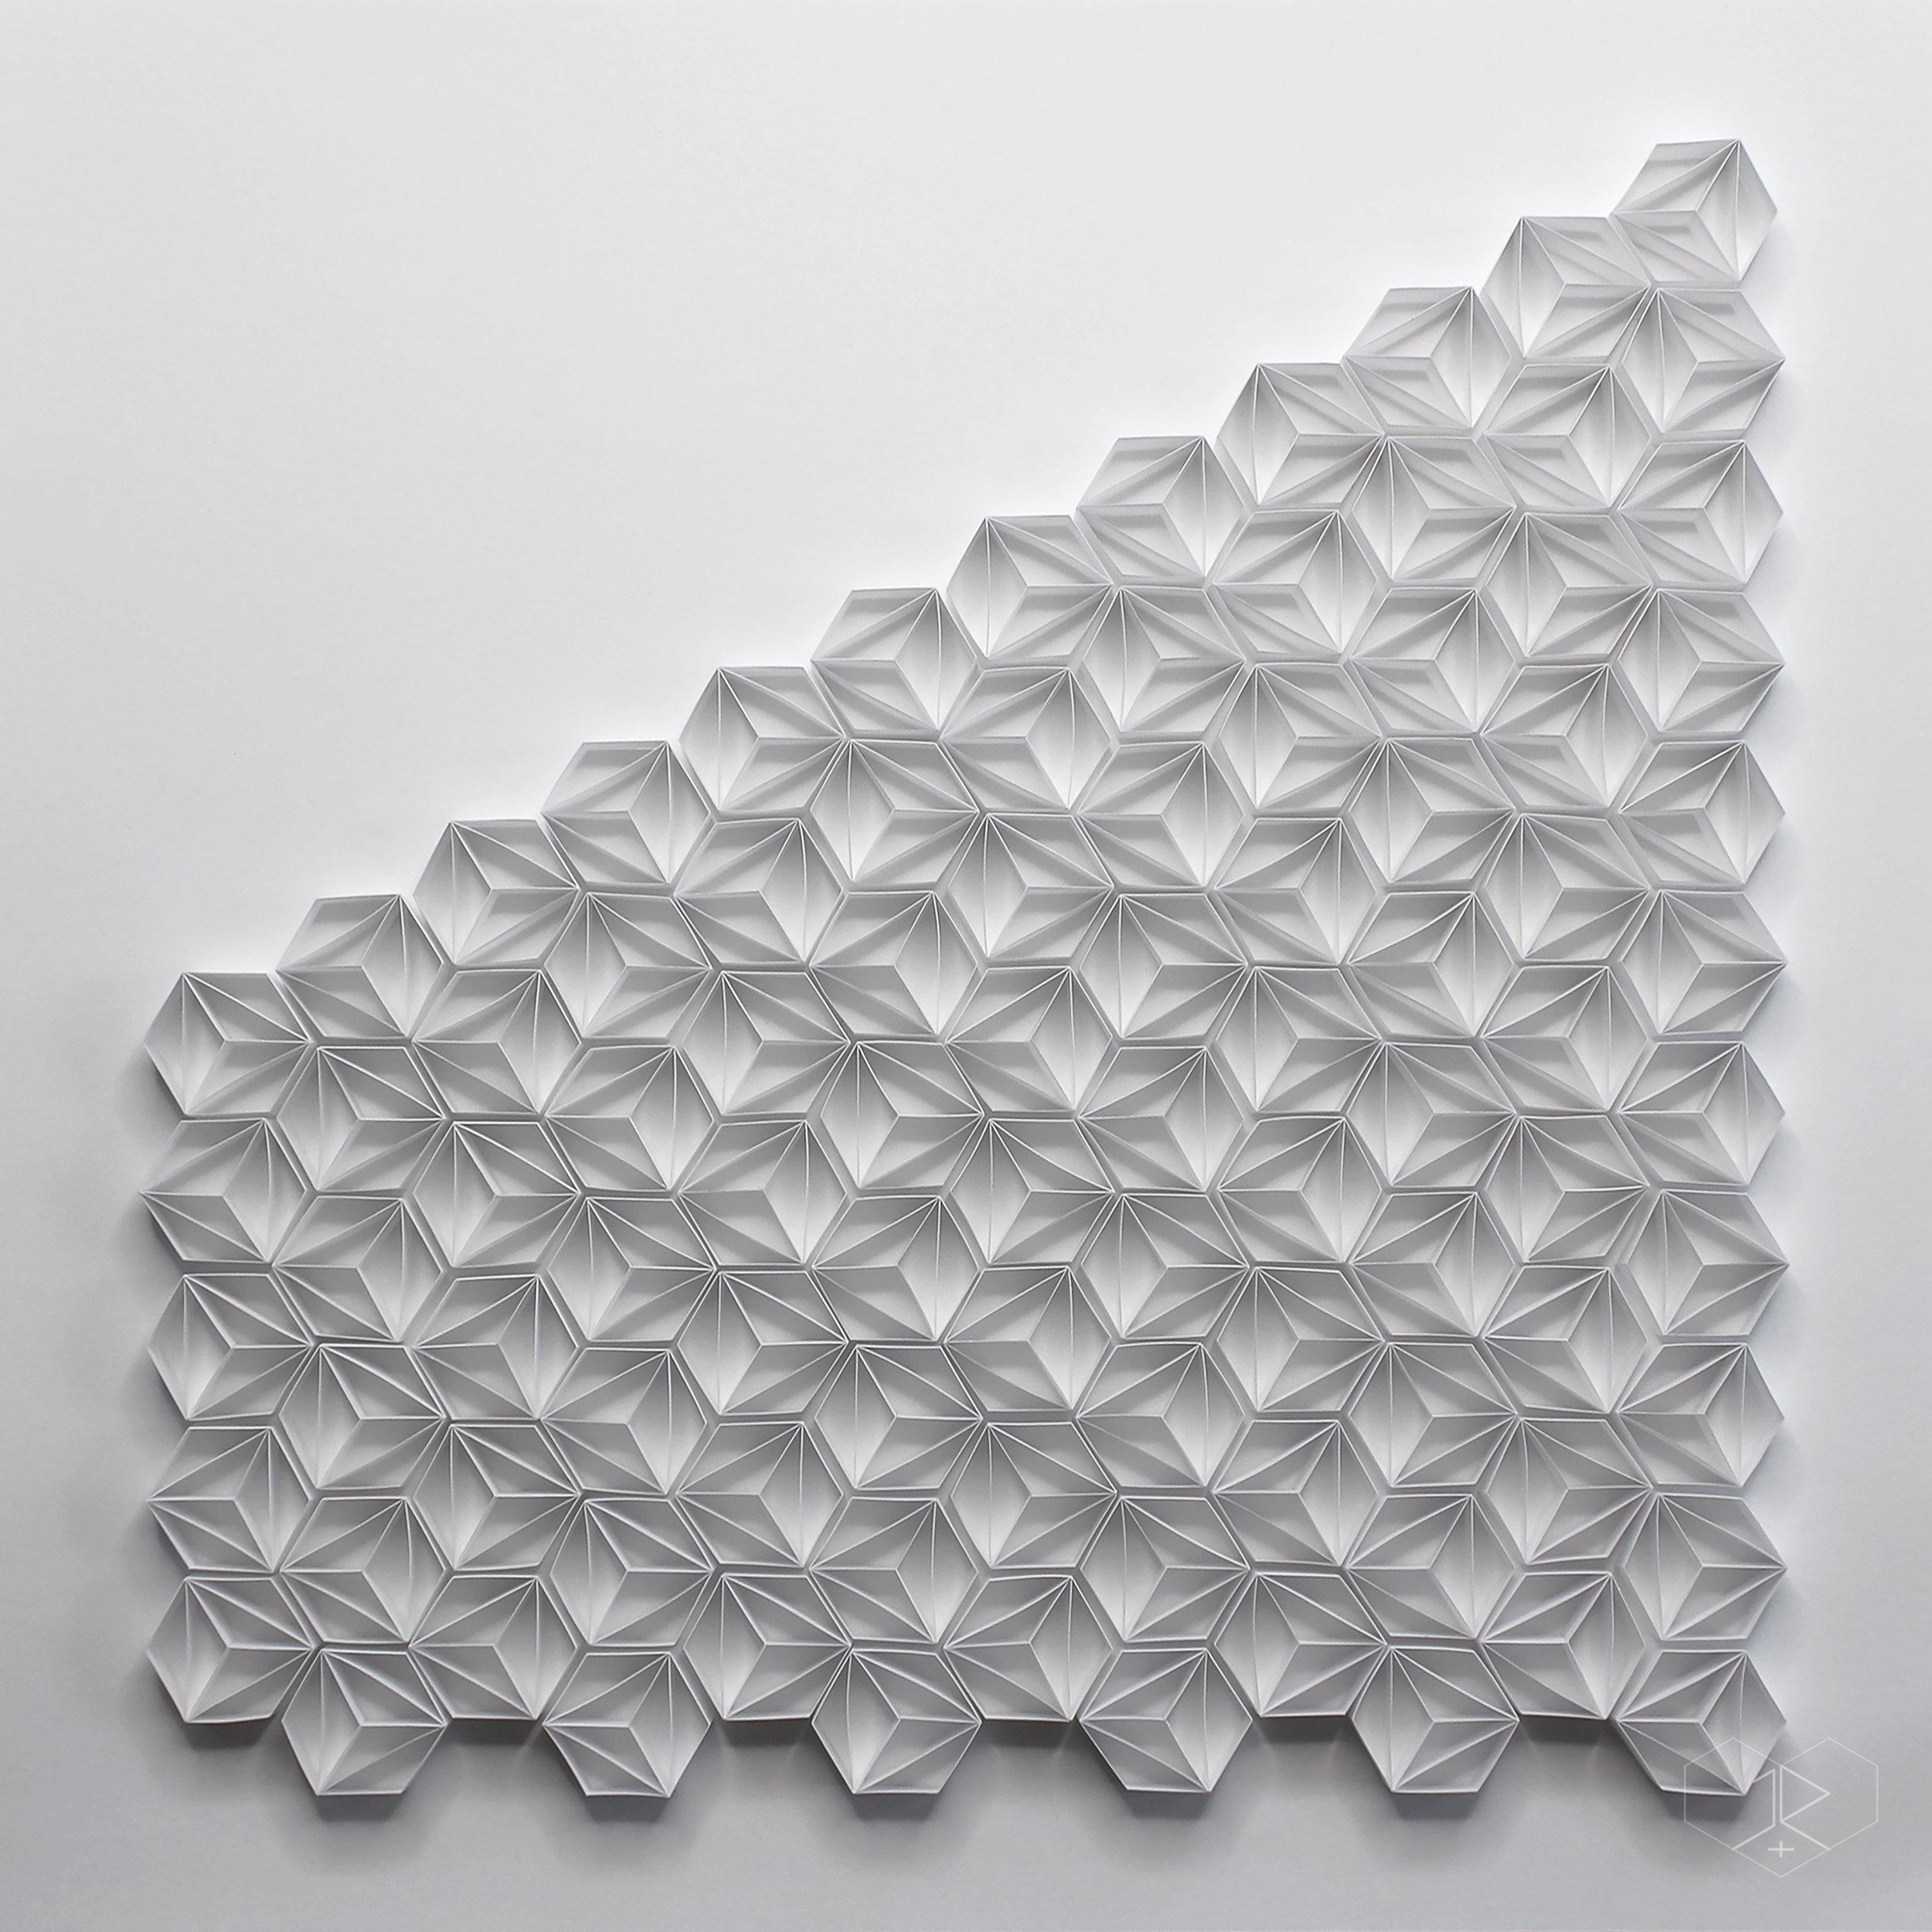 JUDiTH+ROLFE_Geometric_Cube.jpg